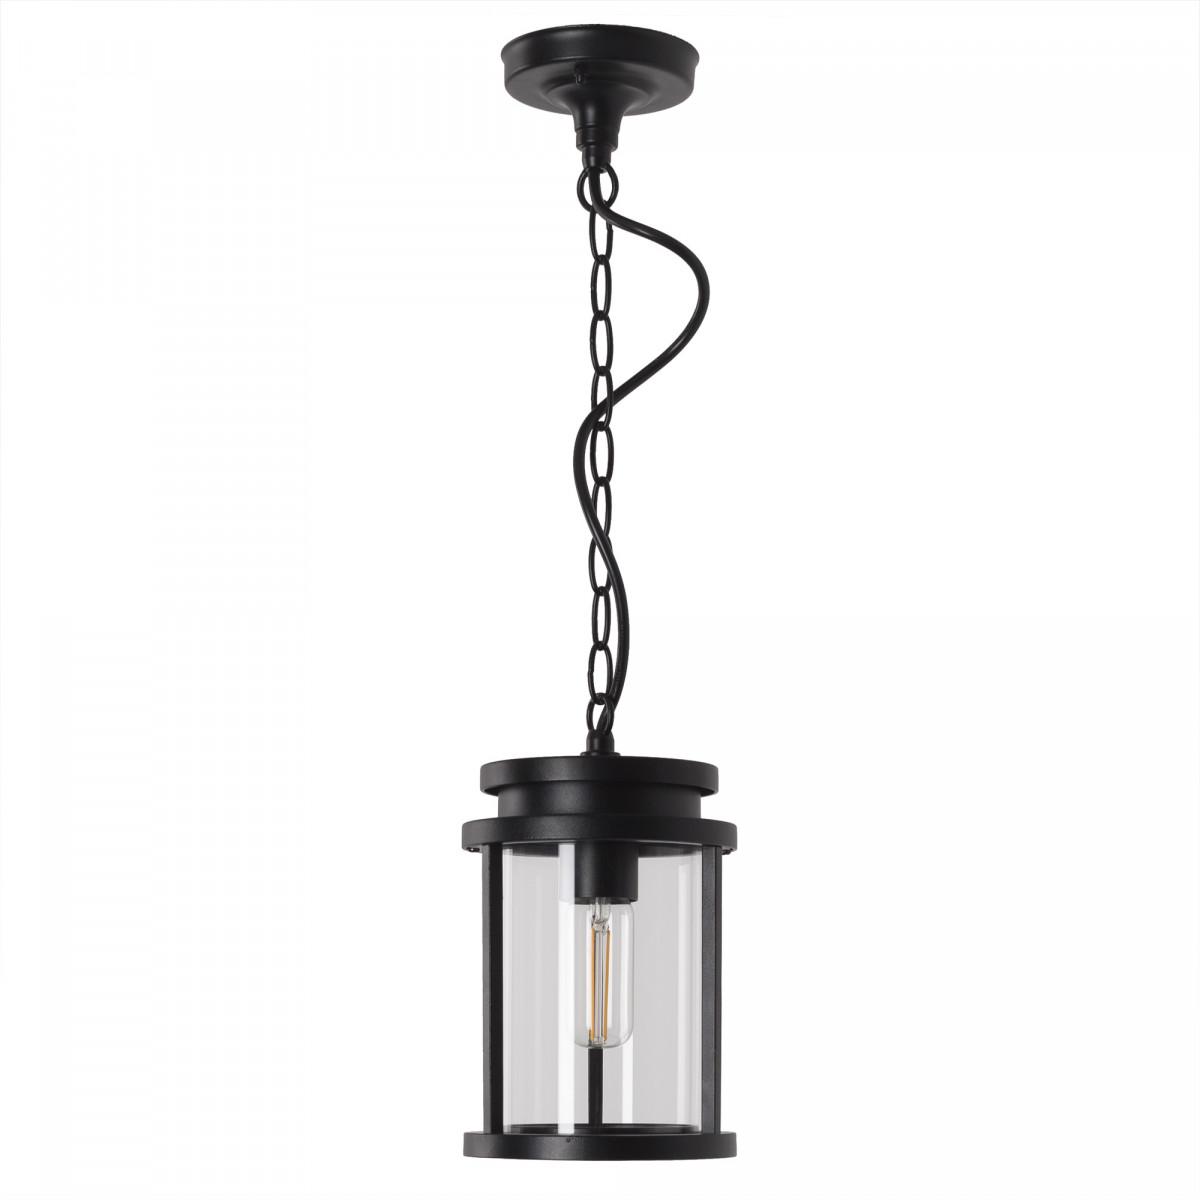 hanglamp overkapping - veranda lampen - veranda lamp Sydney aan ketting (7605) - KS Verlichting - Nostalux